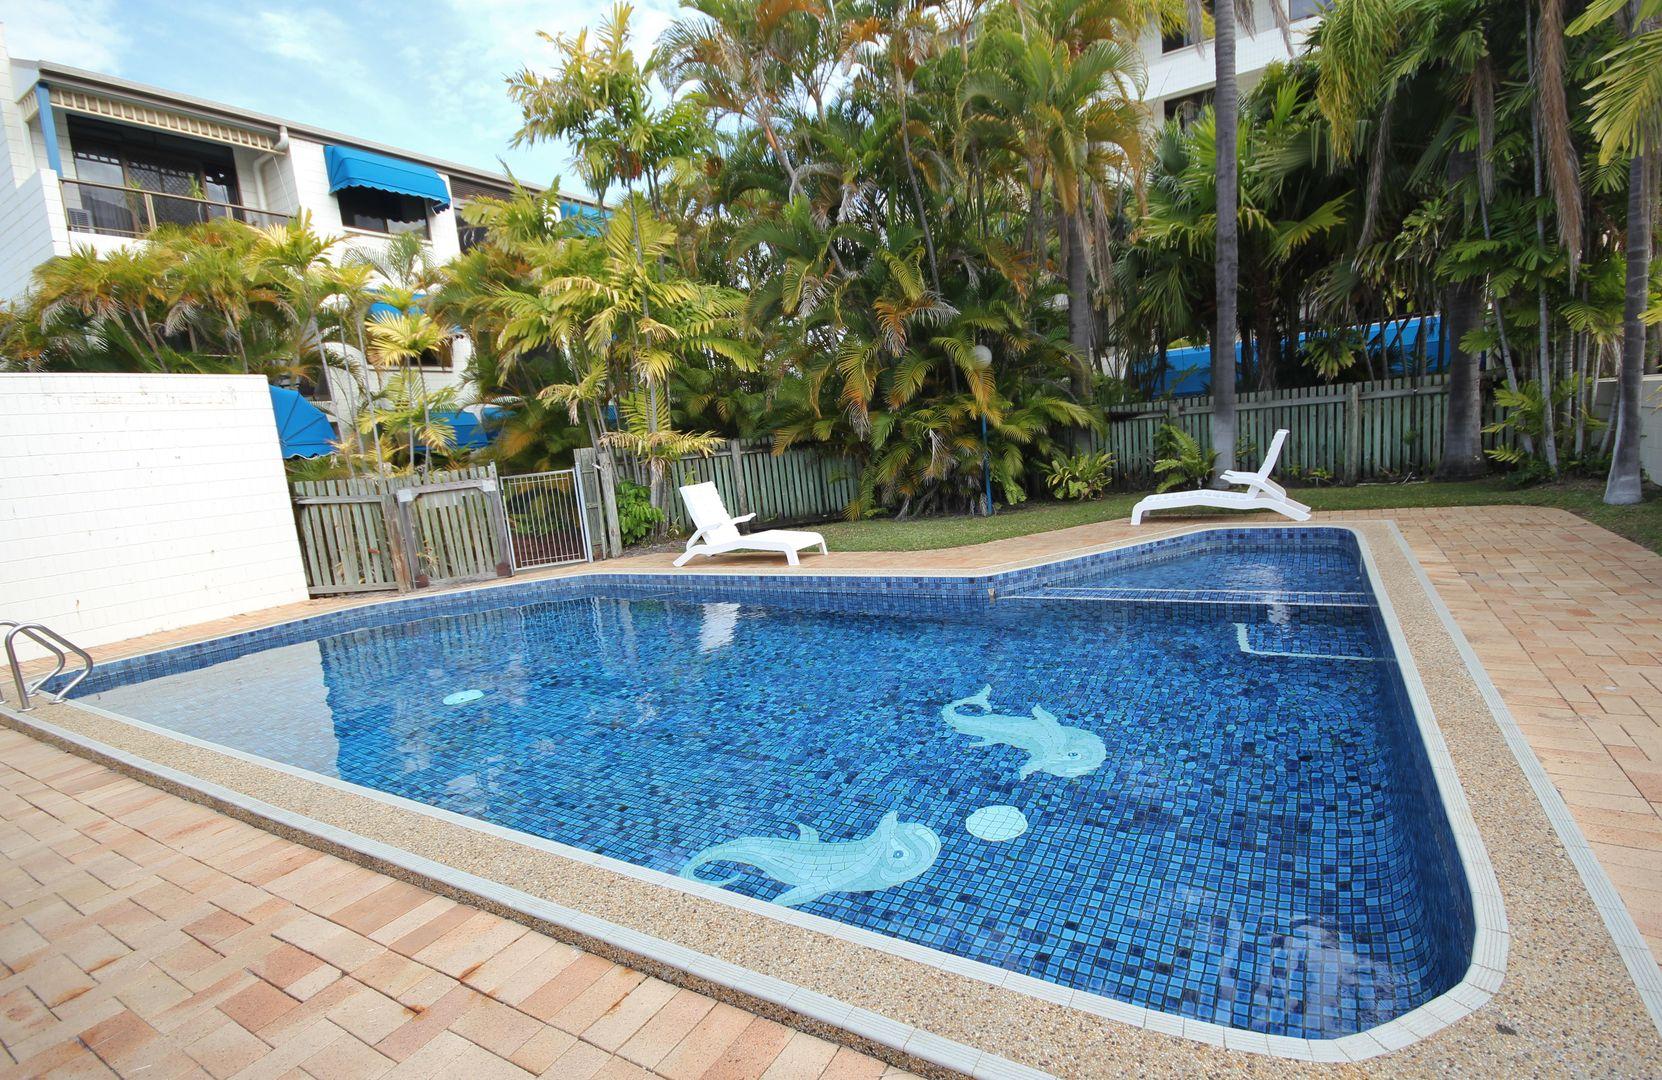 13/270 Walker Street, Townsville City QLD 4810, Image 0